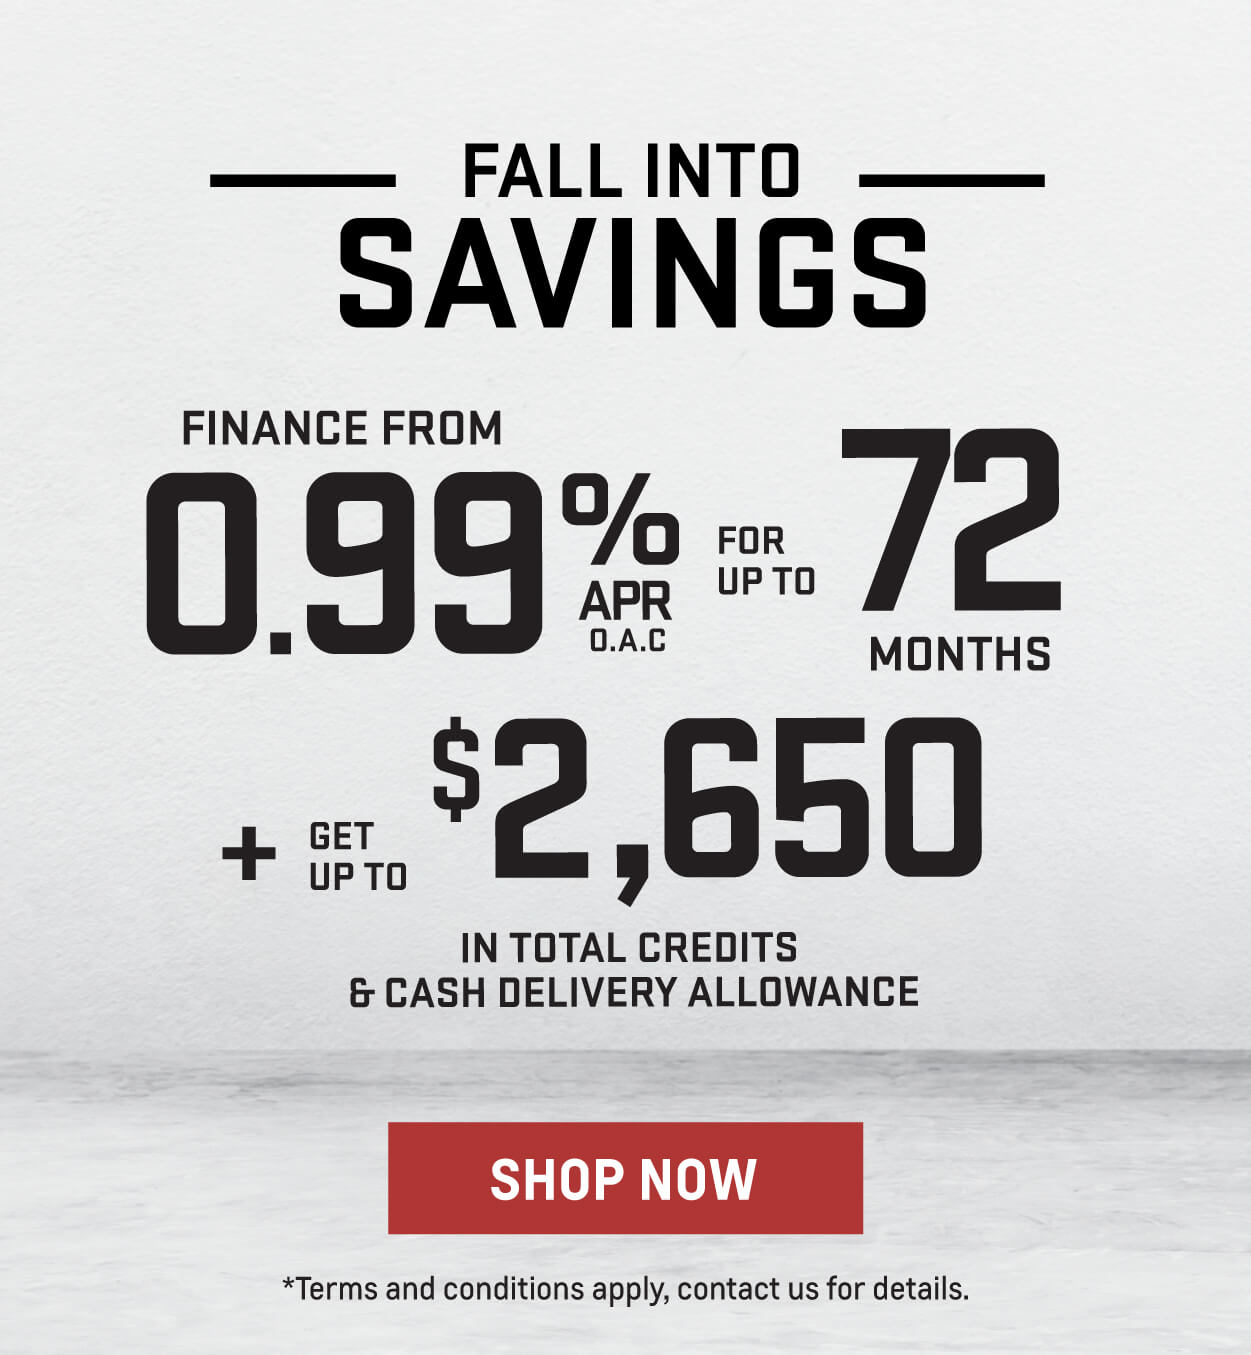 Fall Into Savings GM Trucks - City GM